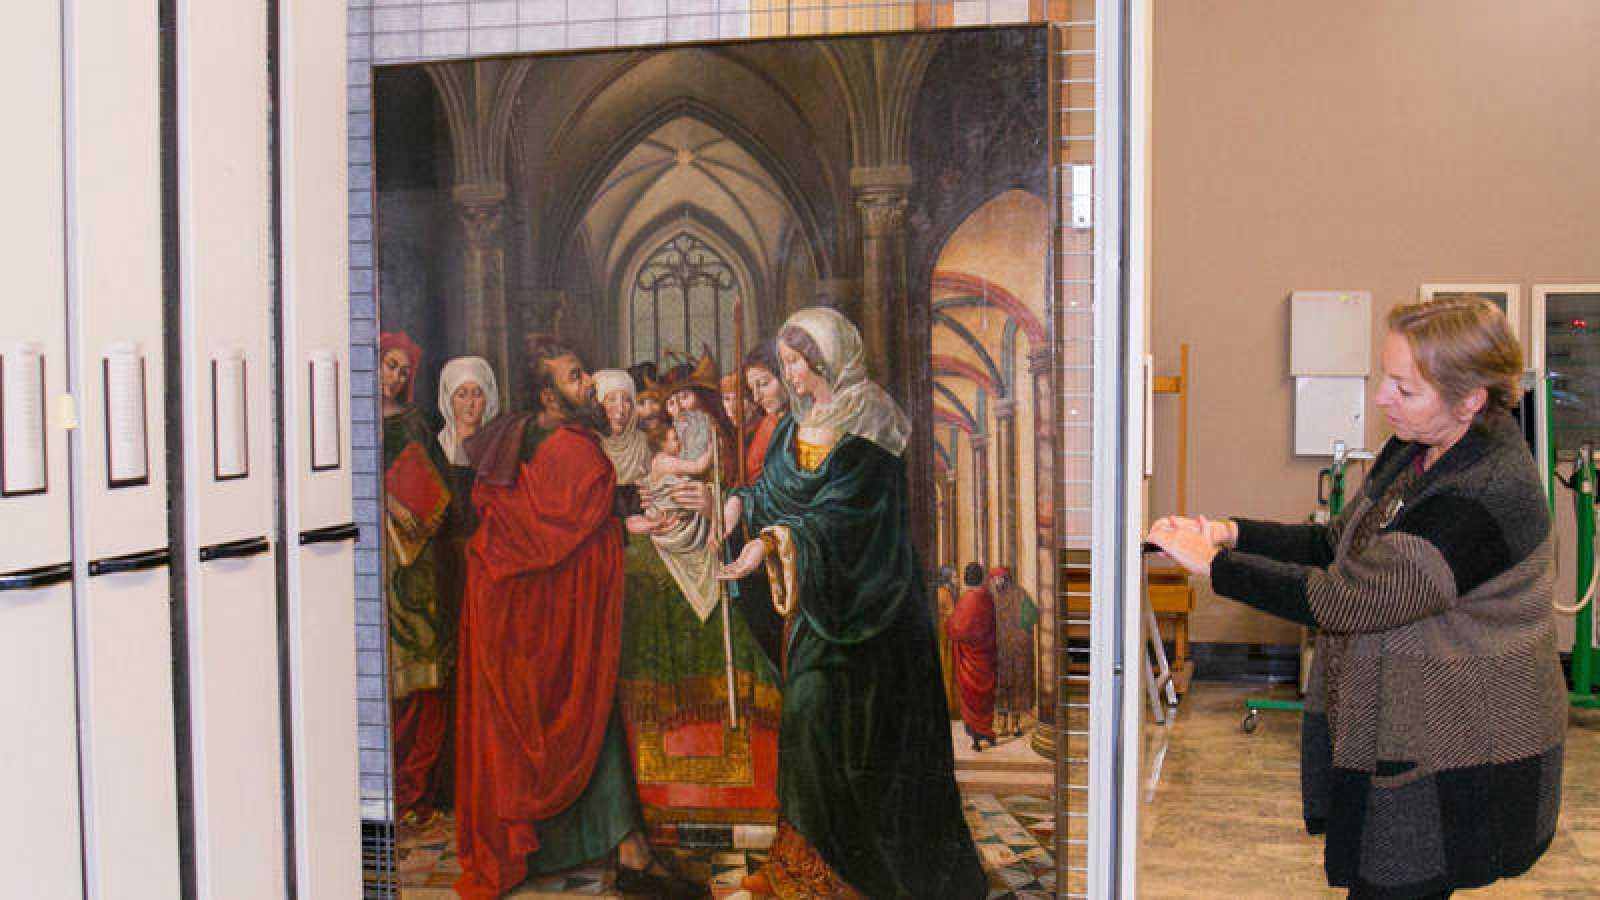 Museo de Zaragoza custodia una tabla de Sijena a expensas del fin del litigio